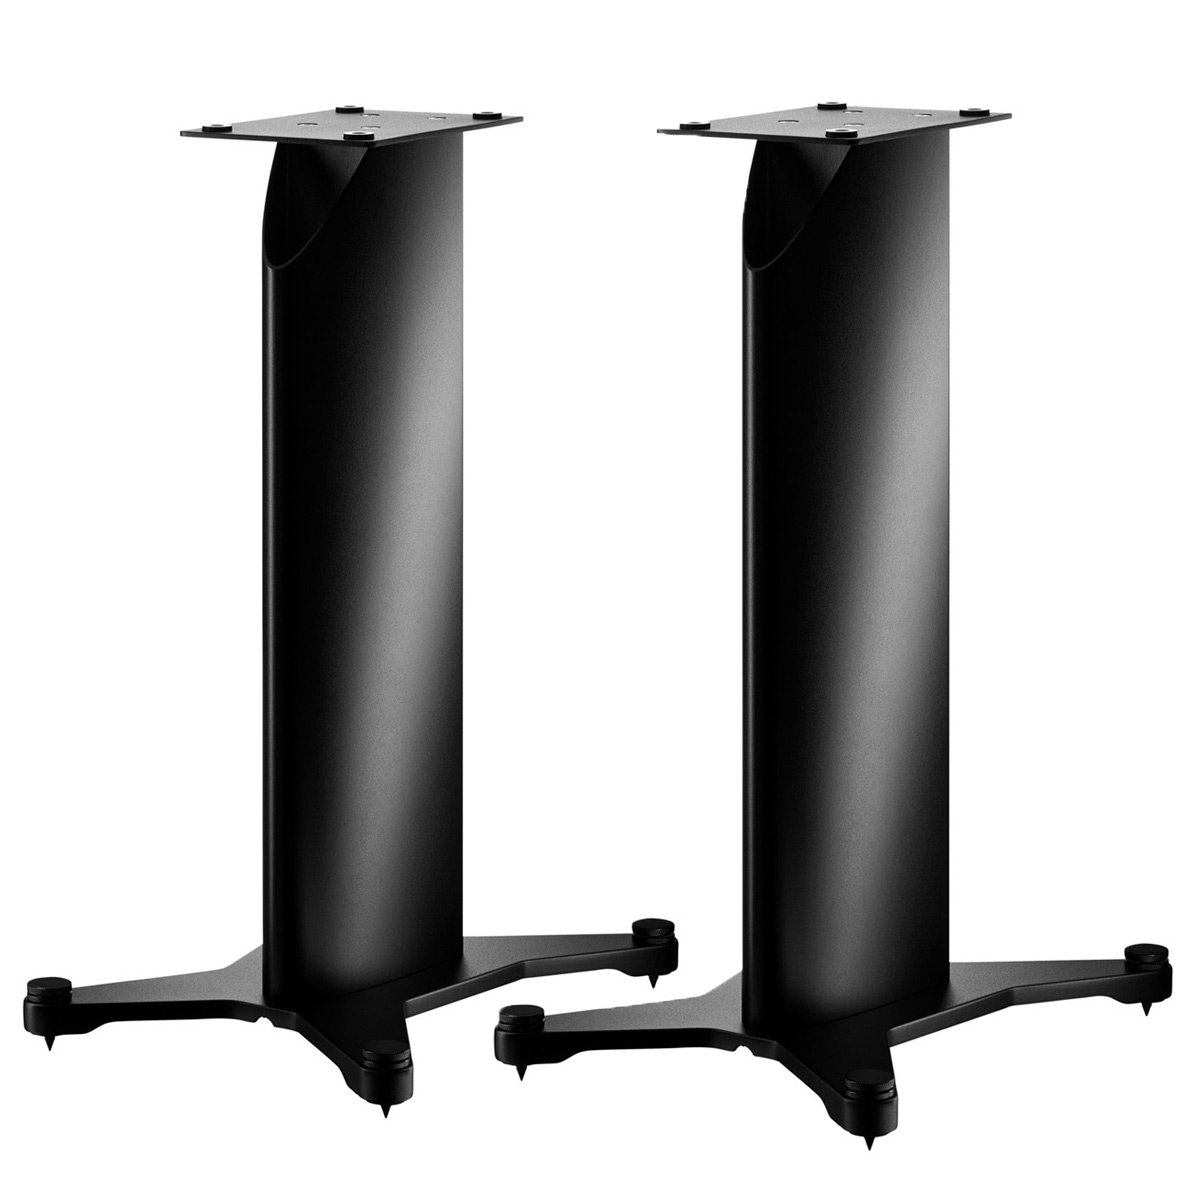 Dynaudio Stand 20 Speaker Stands for Bookshelf Speakers - Pair (Satin Black)